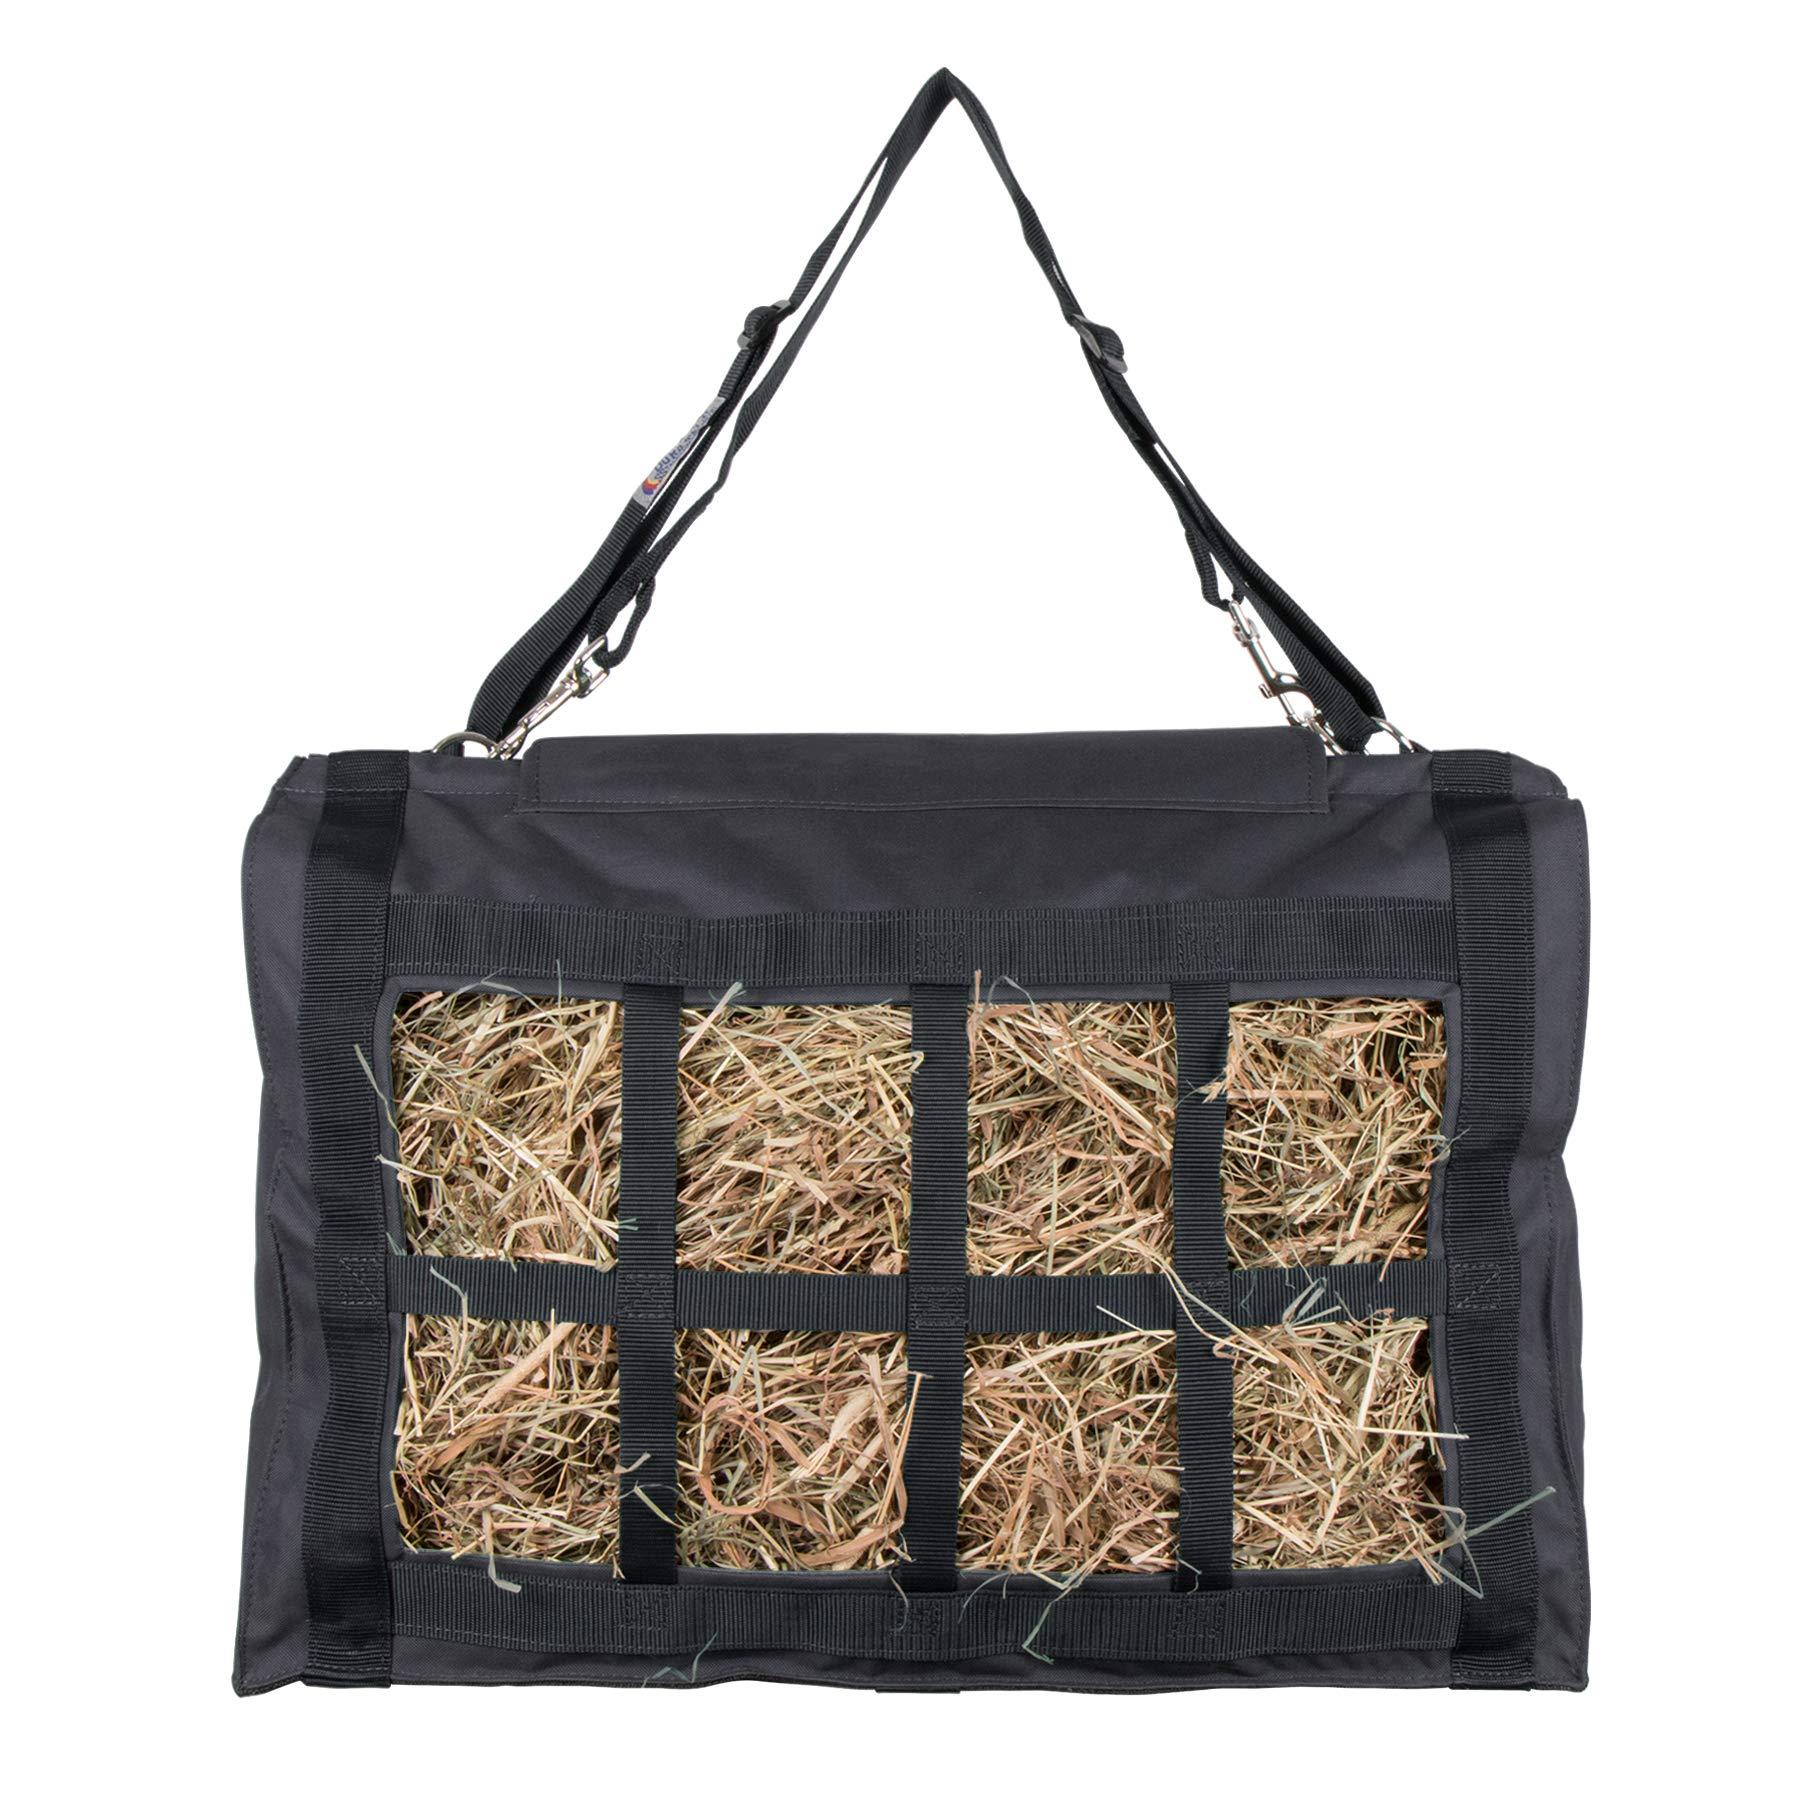 Dura-Tech XL Reinforced Top Hay Saver Bag (Black)